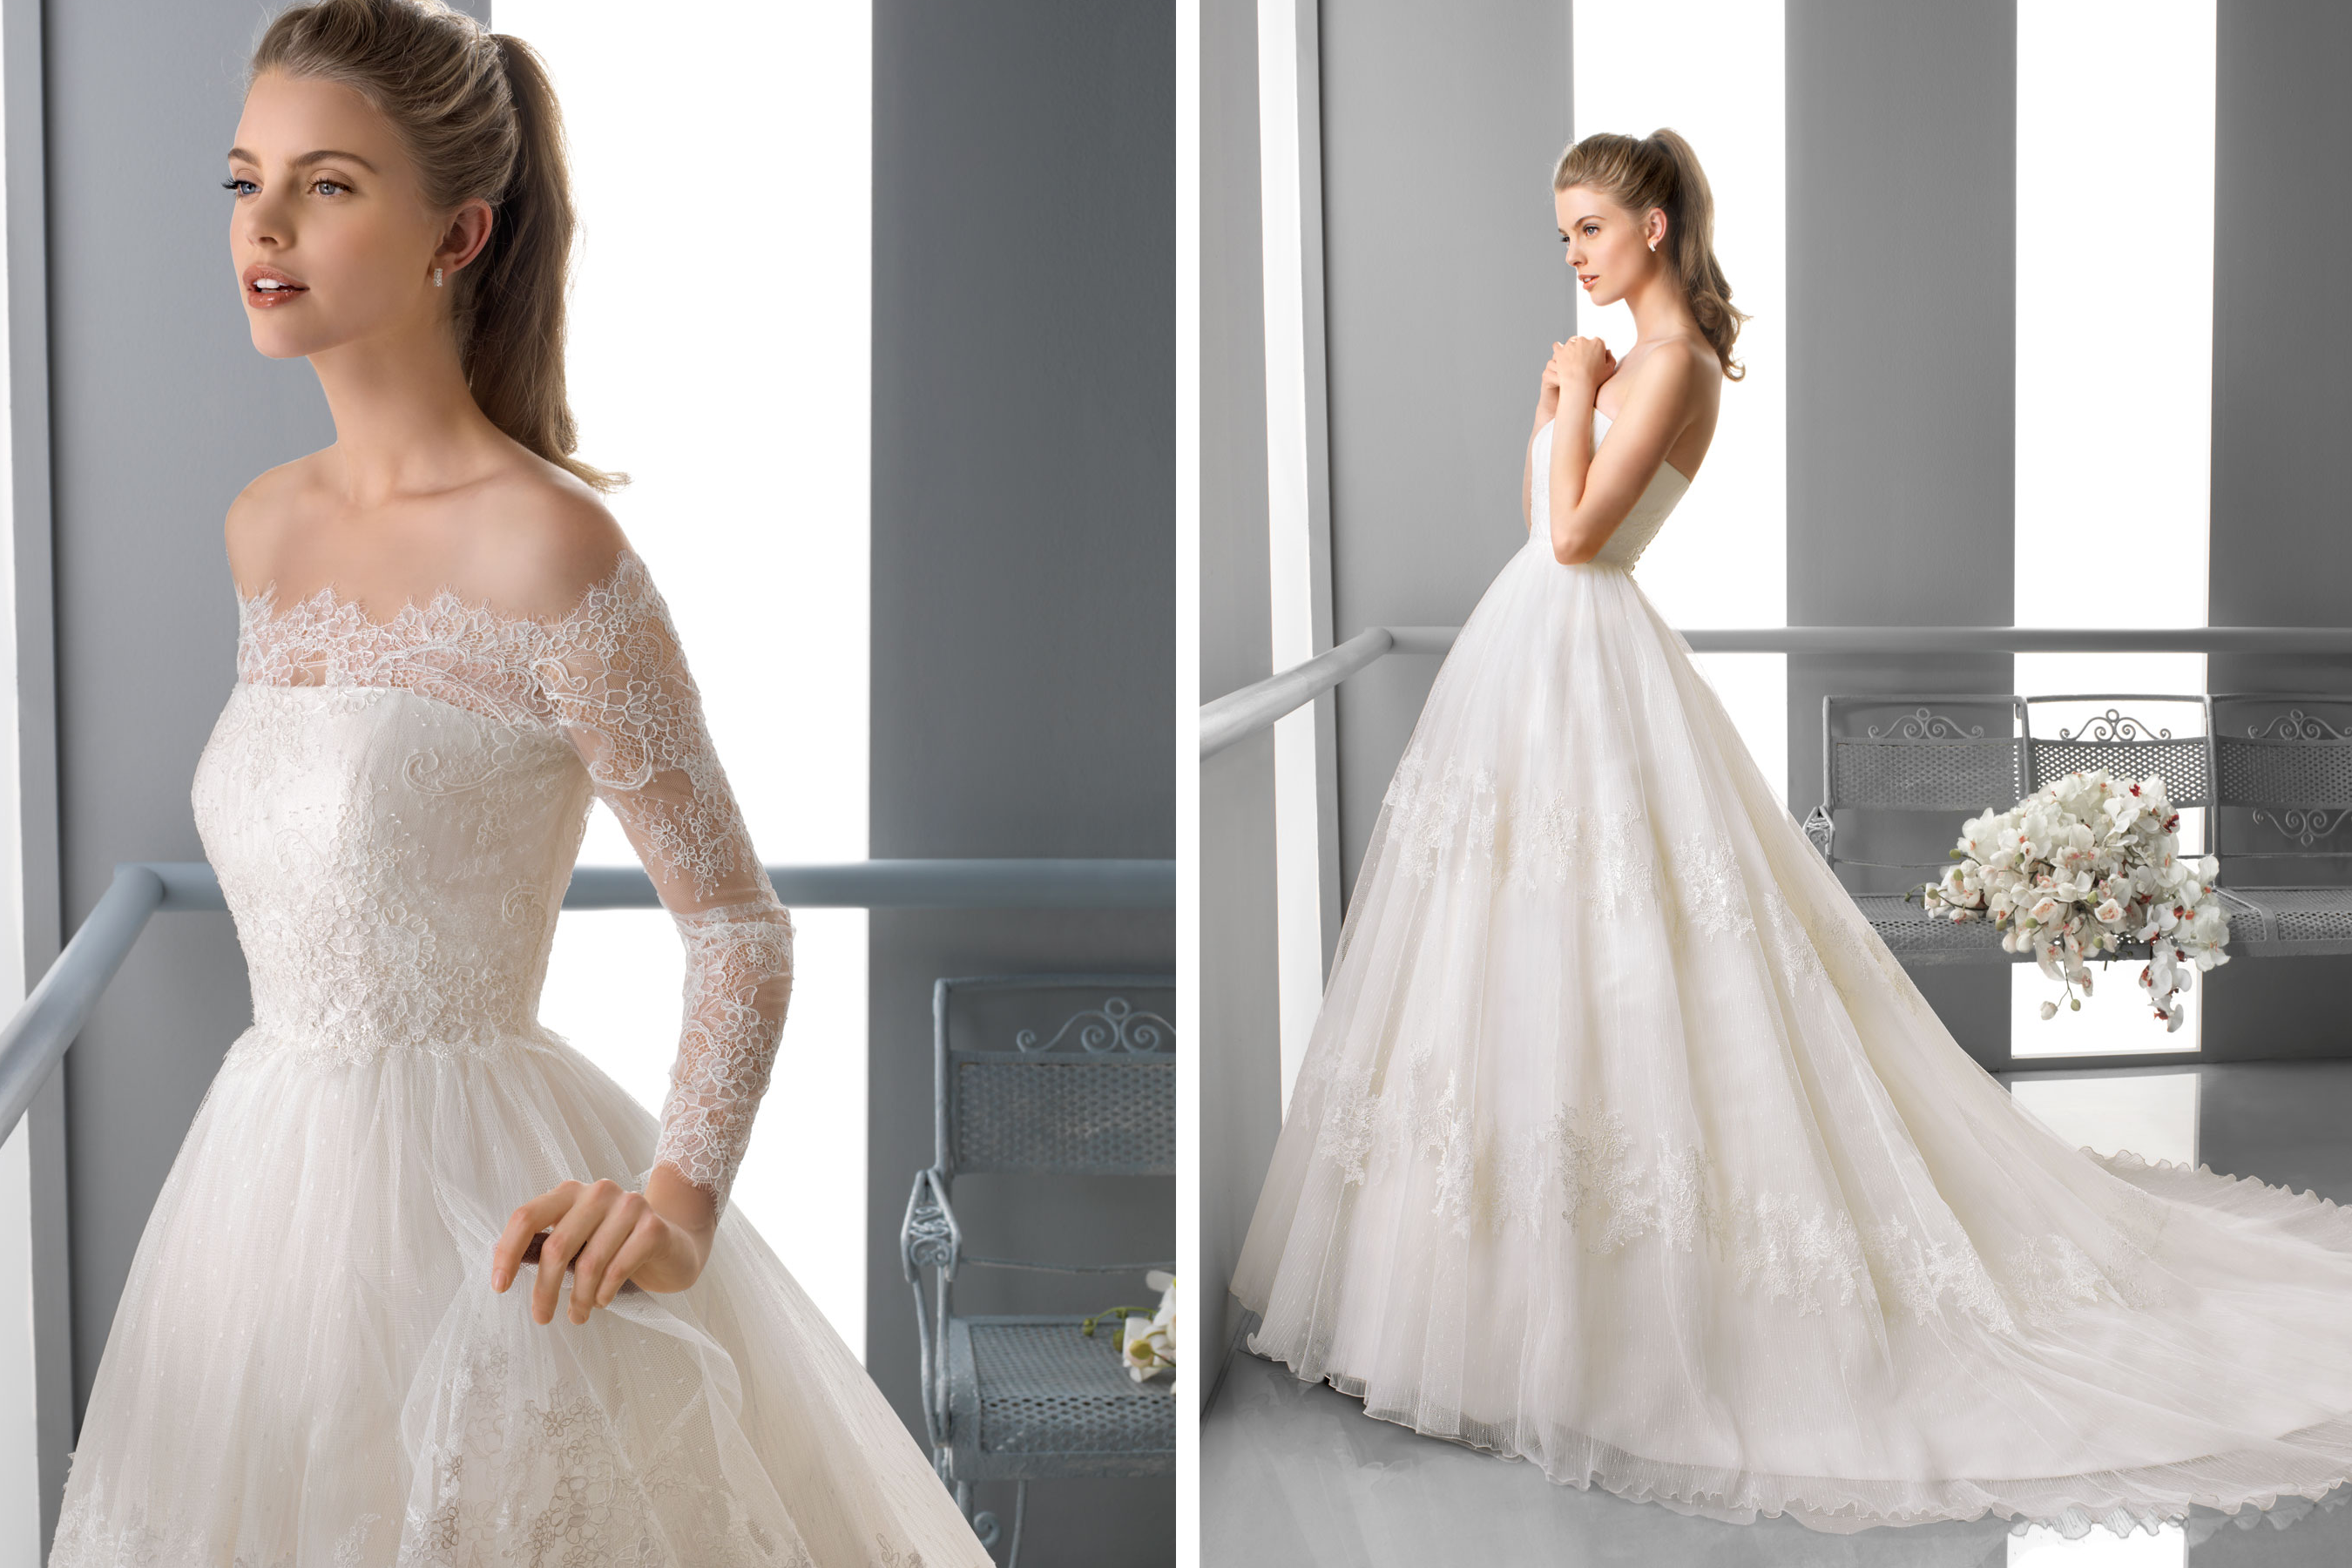 Alma novia wedding dress 2013 bridal fausto for Alma novia wedding dress